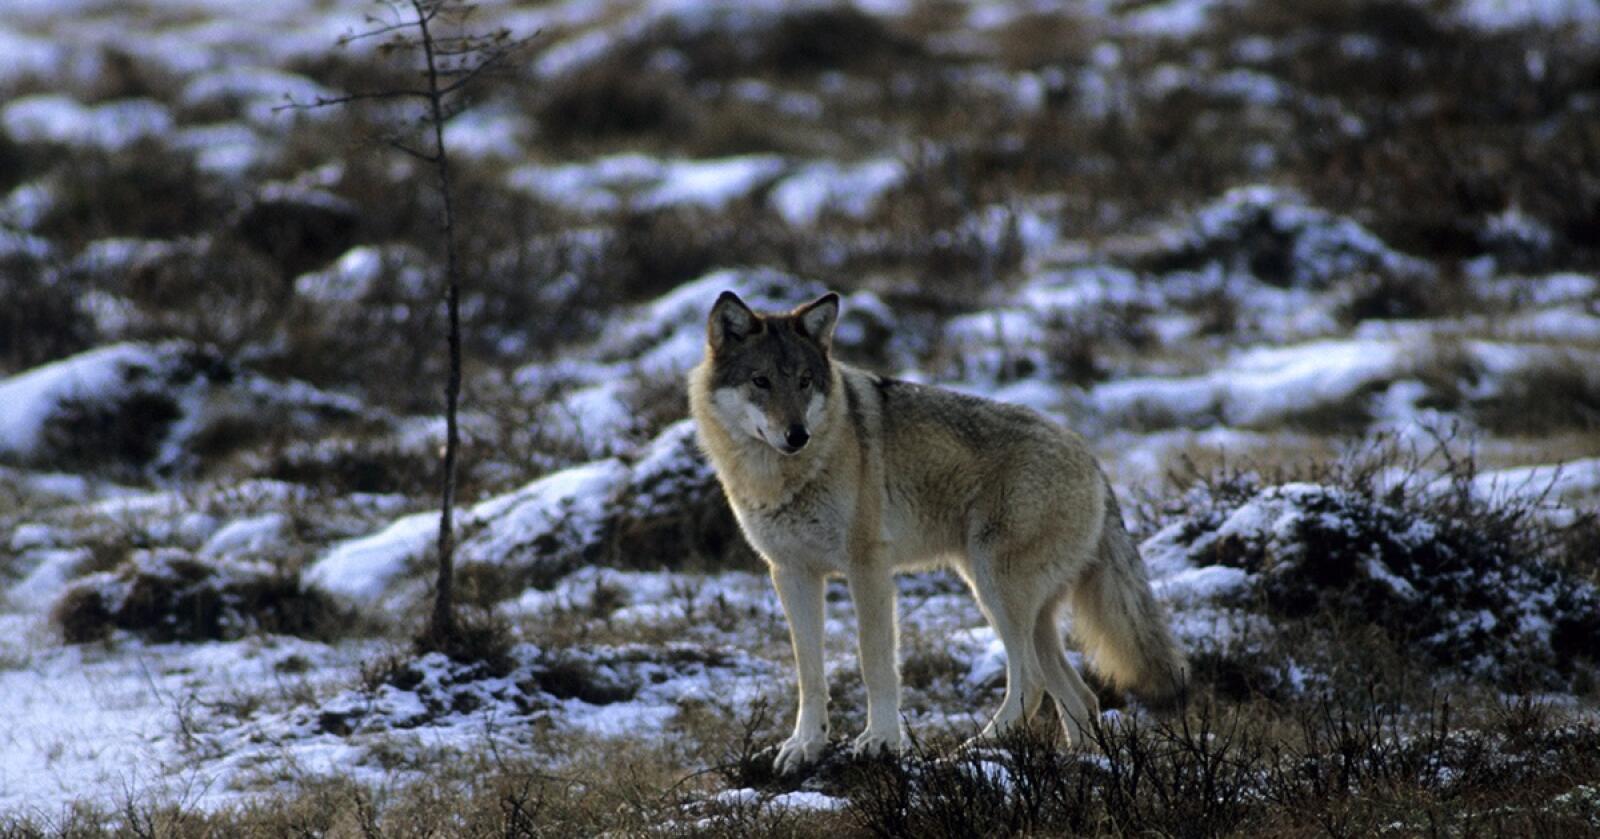 Ung ulvetispe ved Tunhovd. (Foto: Arne Nævra, Rovdata)